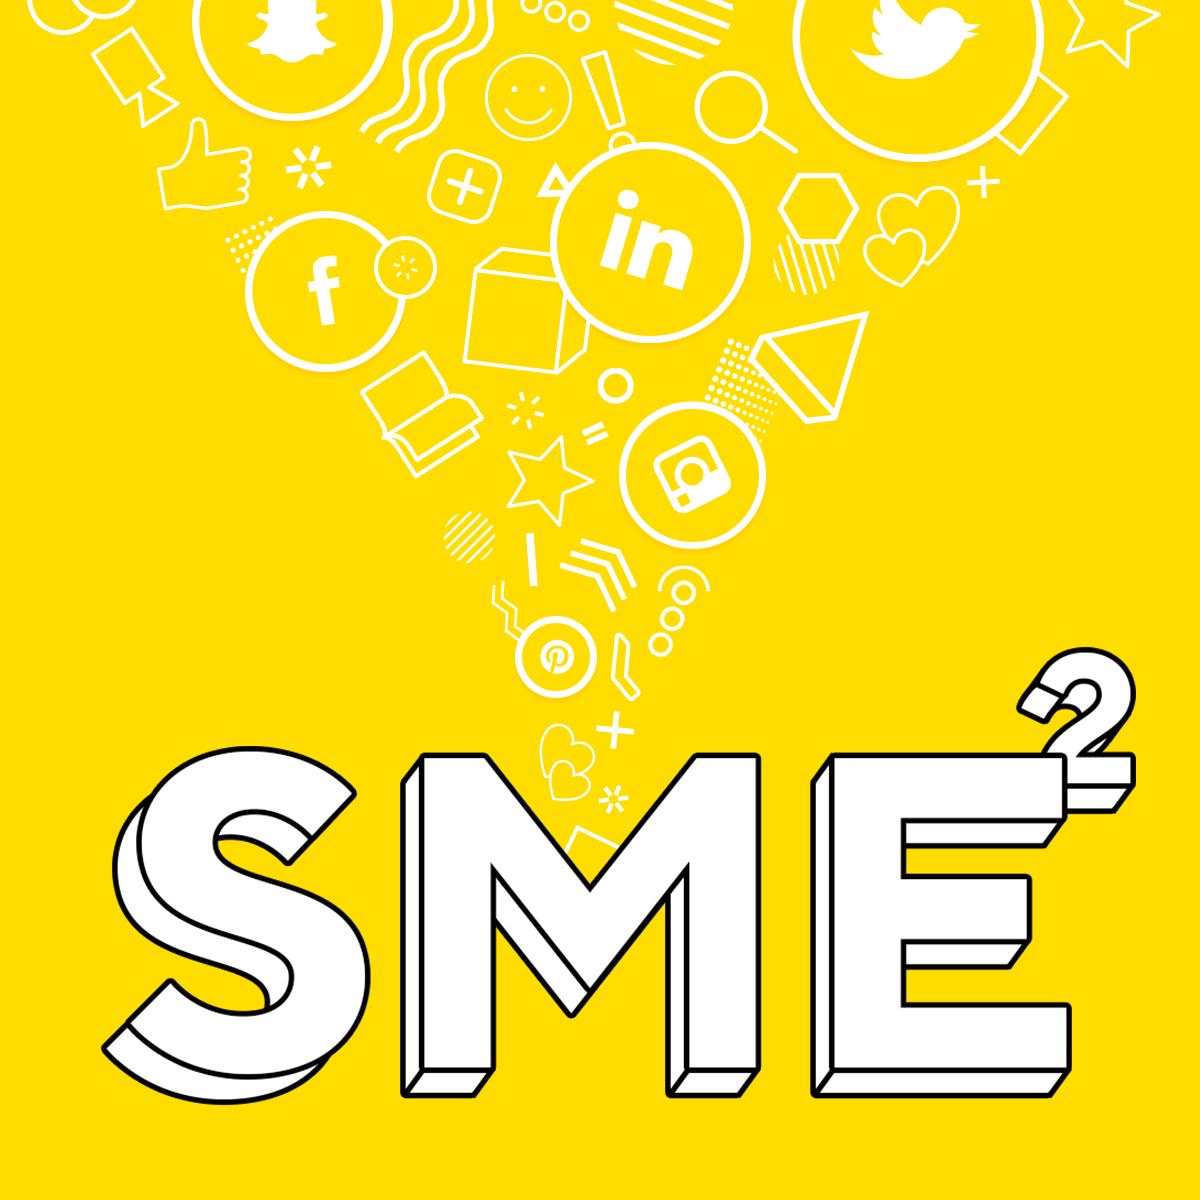 Introducing... SME²